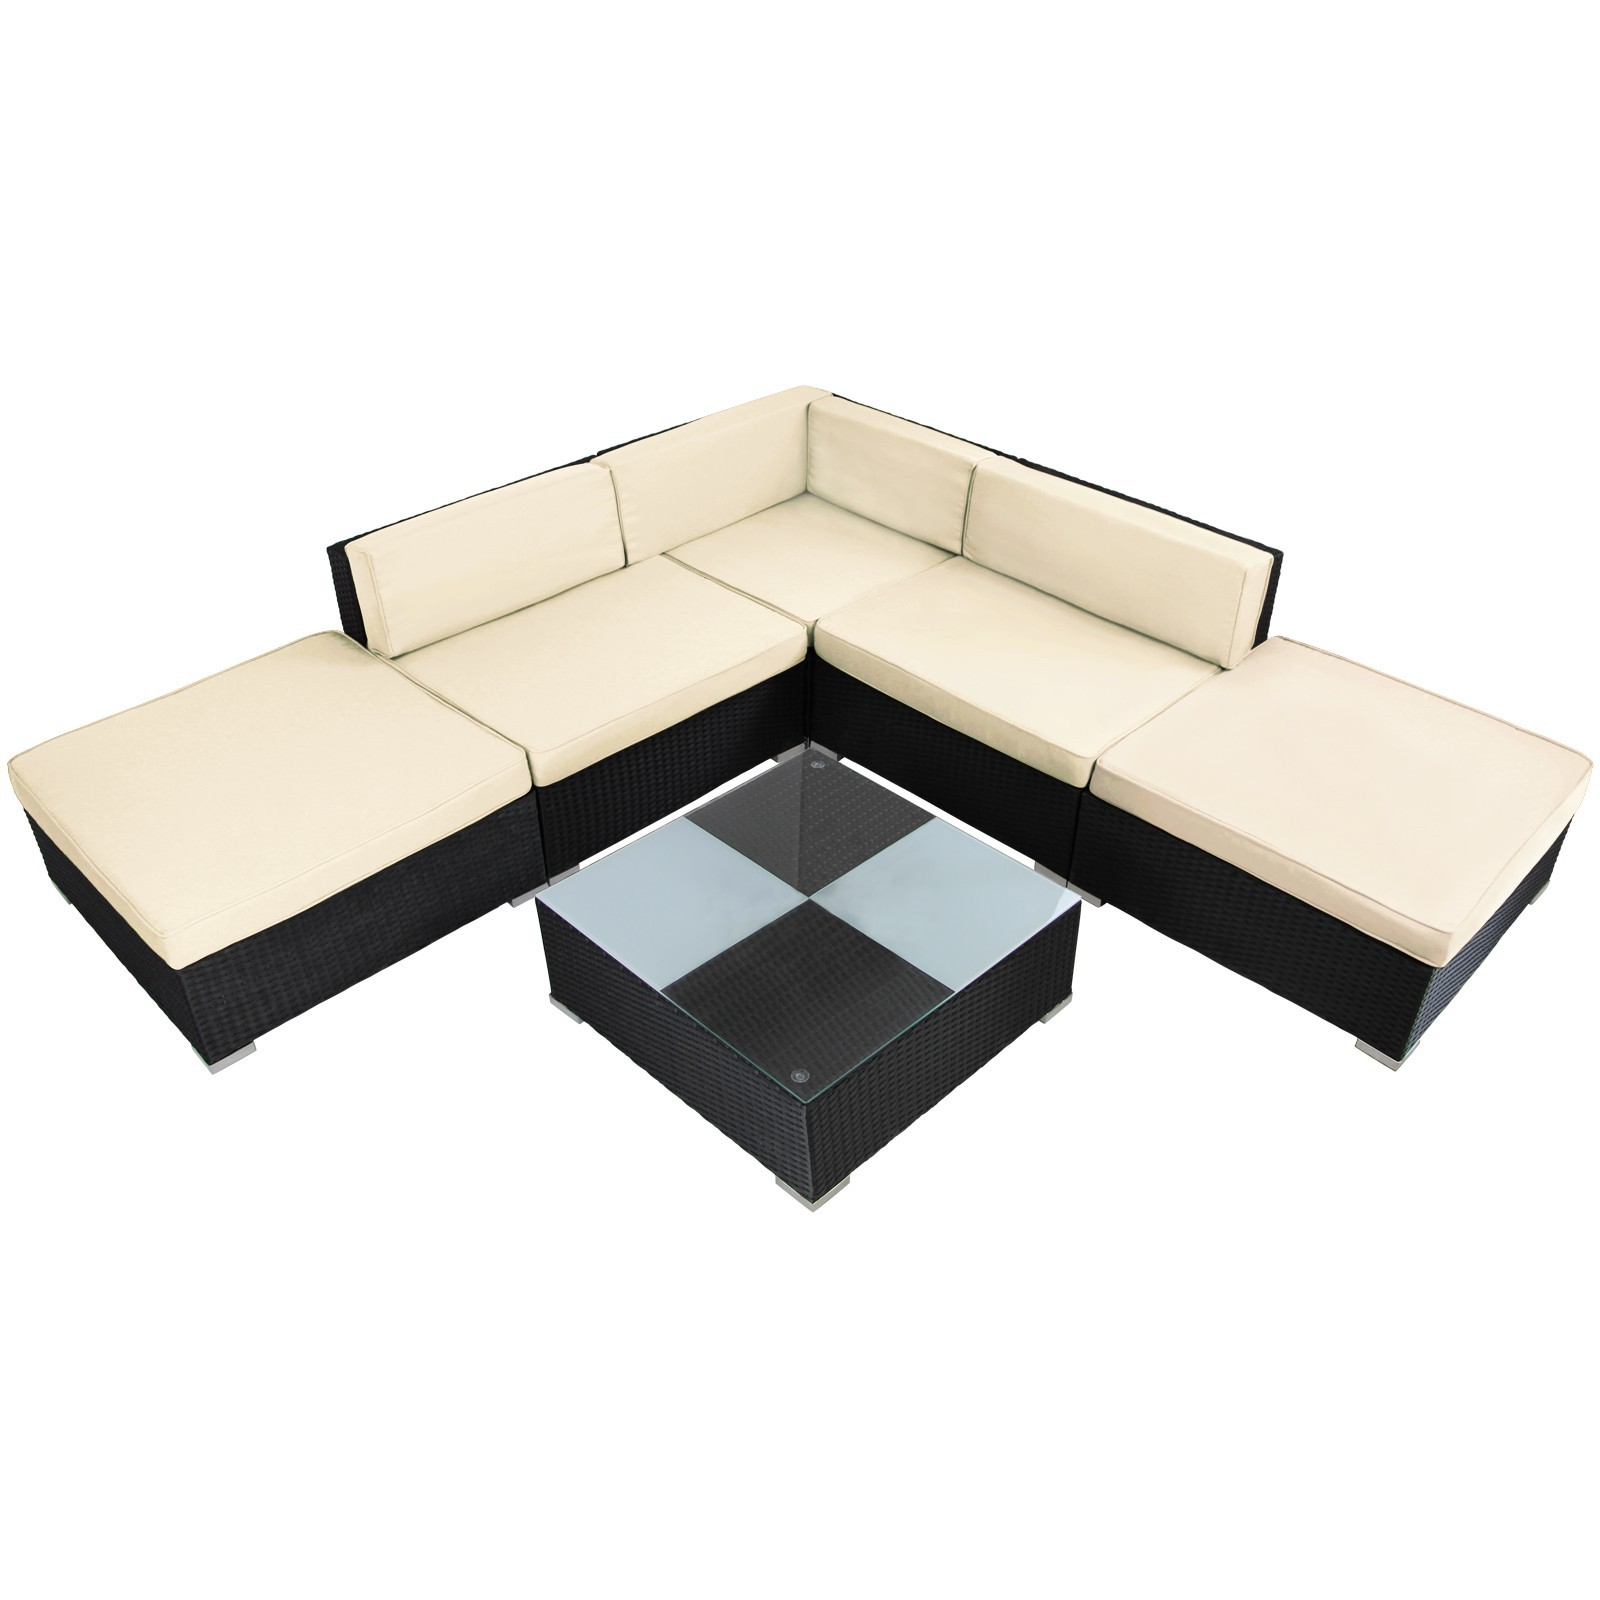 15 teilige polyrattan lounge gartengarnitur arizona mit. Black Bedroom Furniture Sets. Home Design Ideas